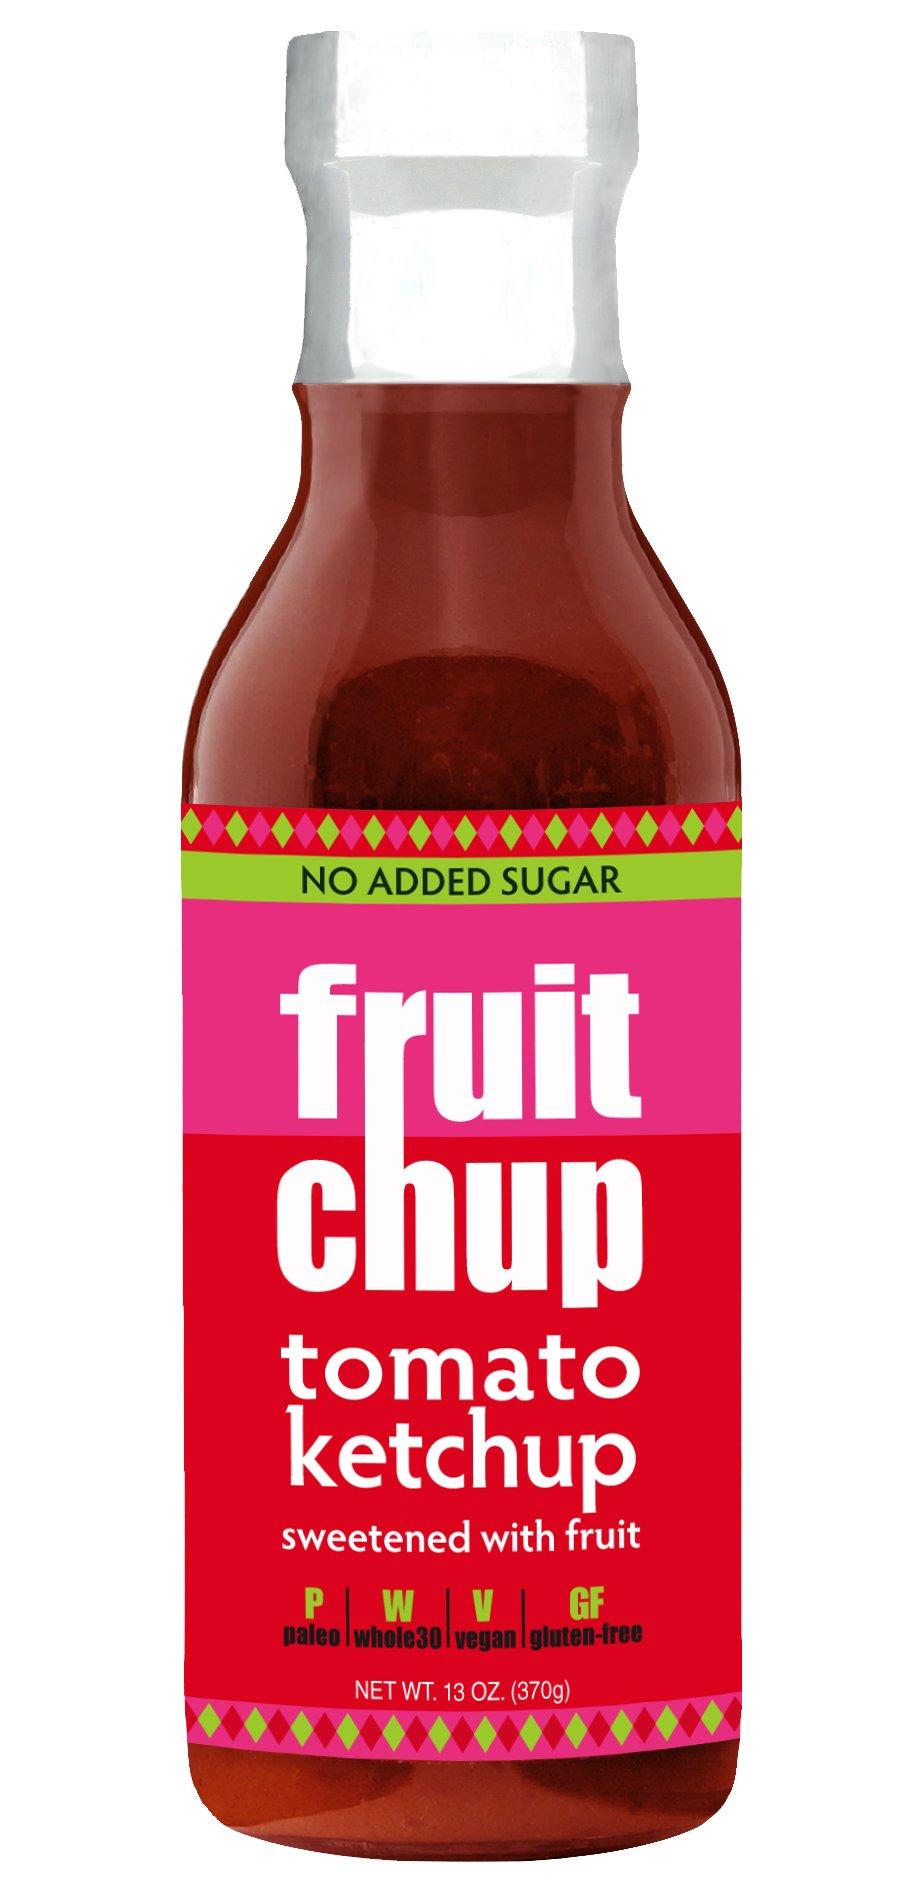 Fruitchup Paleo Ketchup, Whole30, Gluten Free, No Added Sugar,13 oz Bottle (Single bottle)